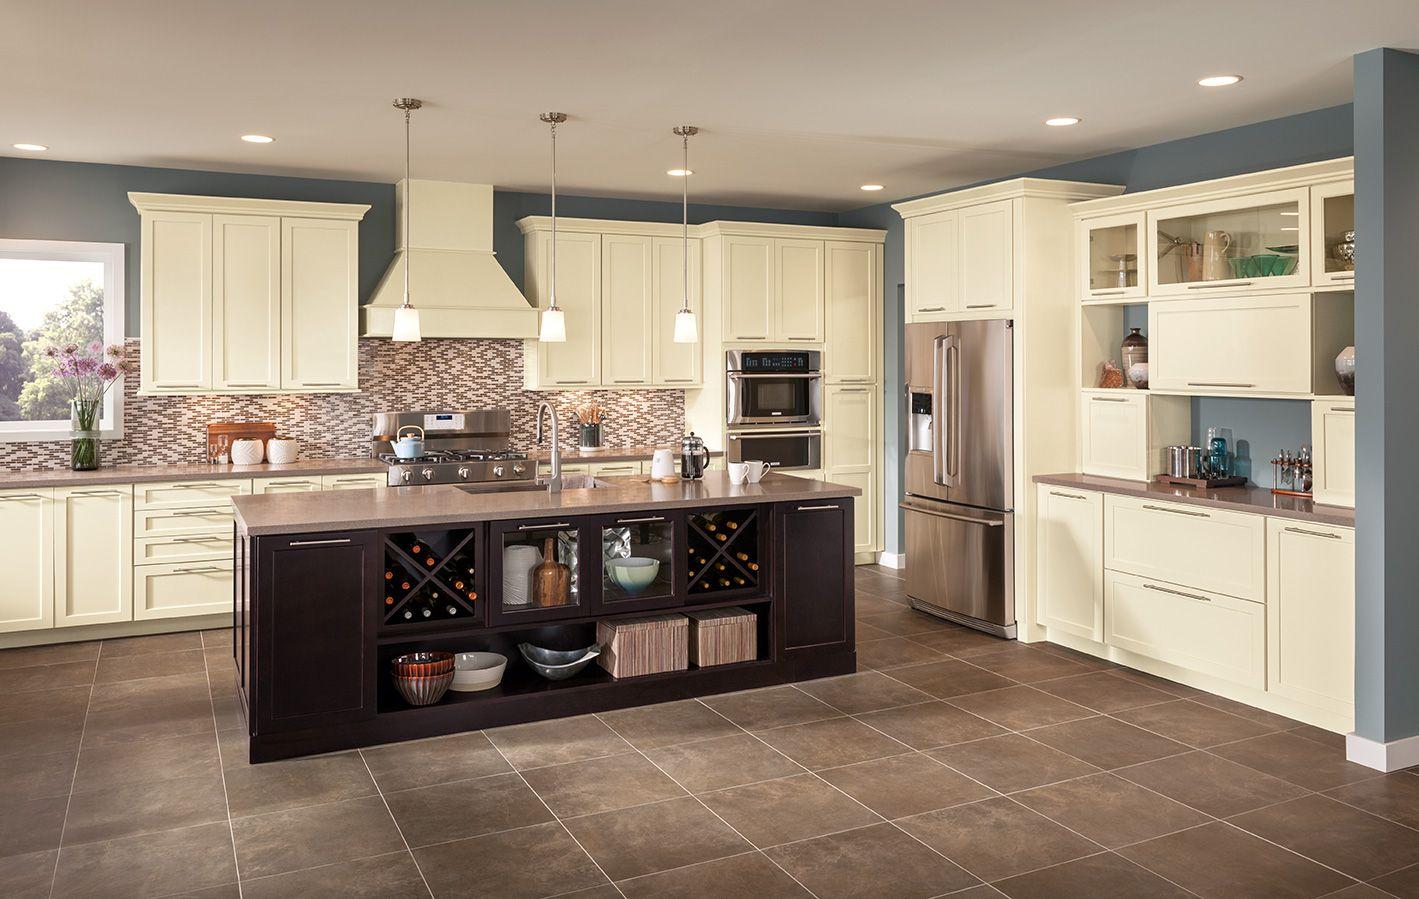 Best Kitchen Gallery: Shenandoah Cabi Ry Island In Breckenridge Maple Espresso of Shenandoah Kitchen Cabinets on rachelxblog.com